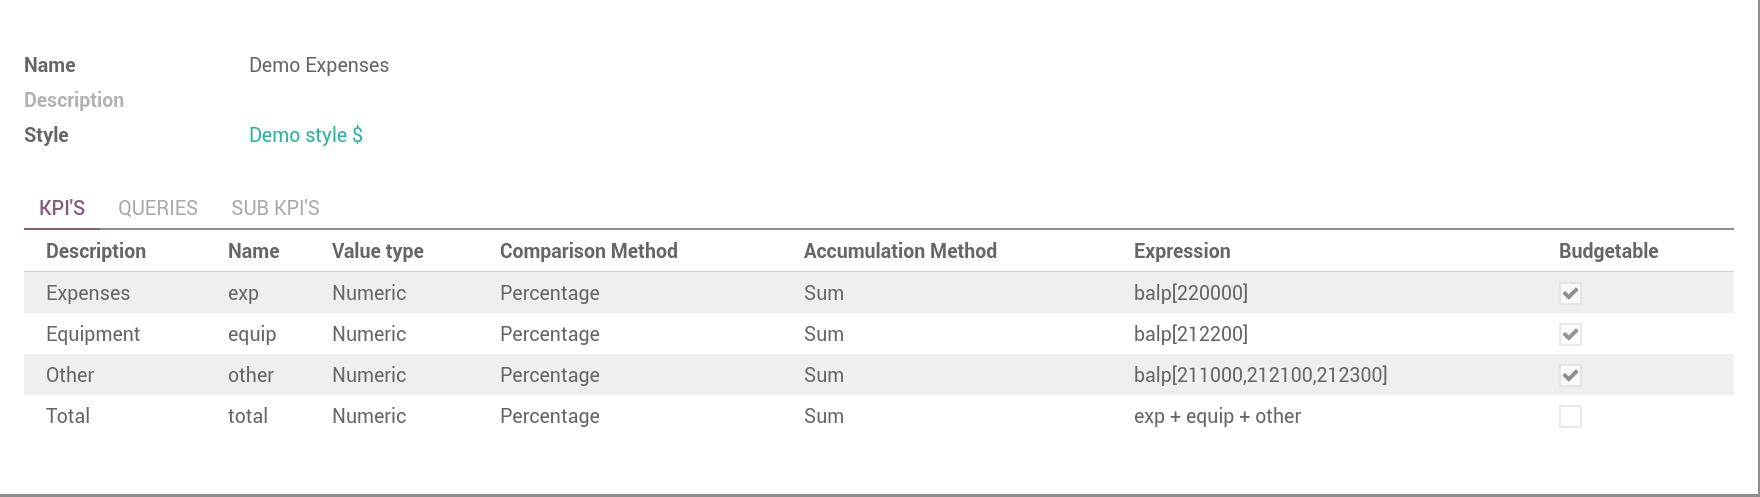 Usage — MIS Builder 3 2 documentation